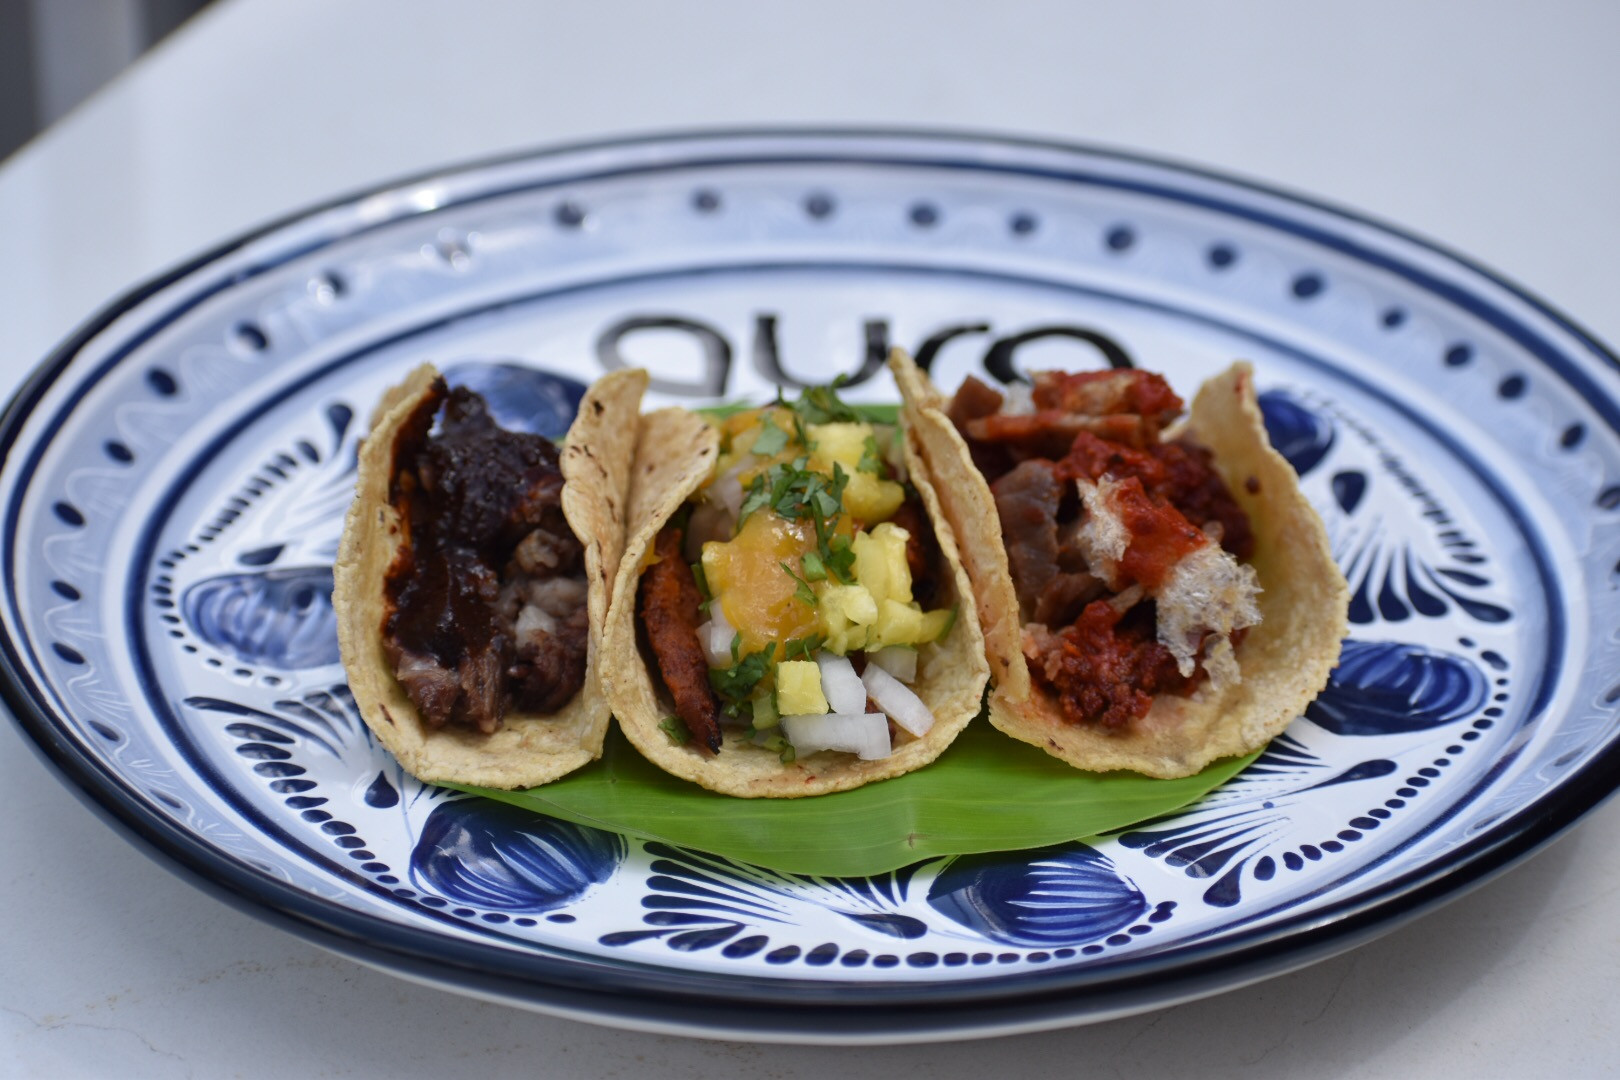 Aura Cocina Mexicana | Cooking Class | Mexico City | Mexican Street Tacos hands-on Cooking Class | Barbacoa, Pastor and Campechano